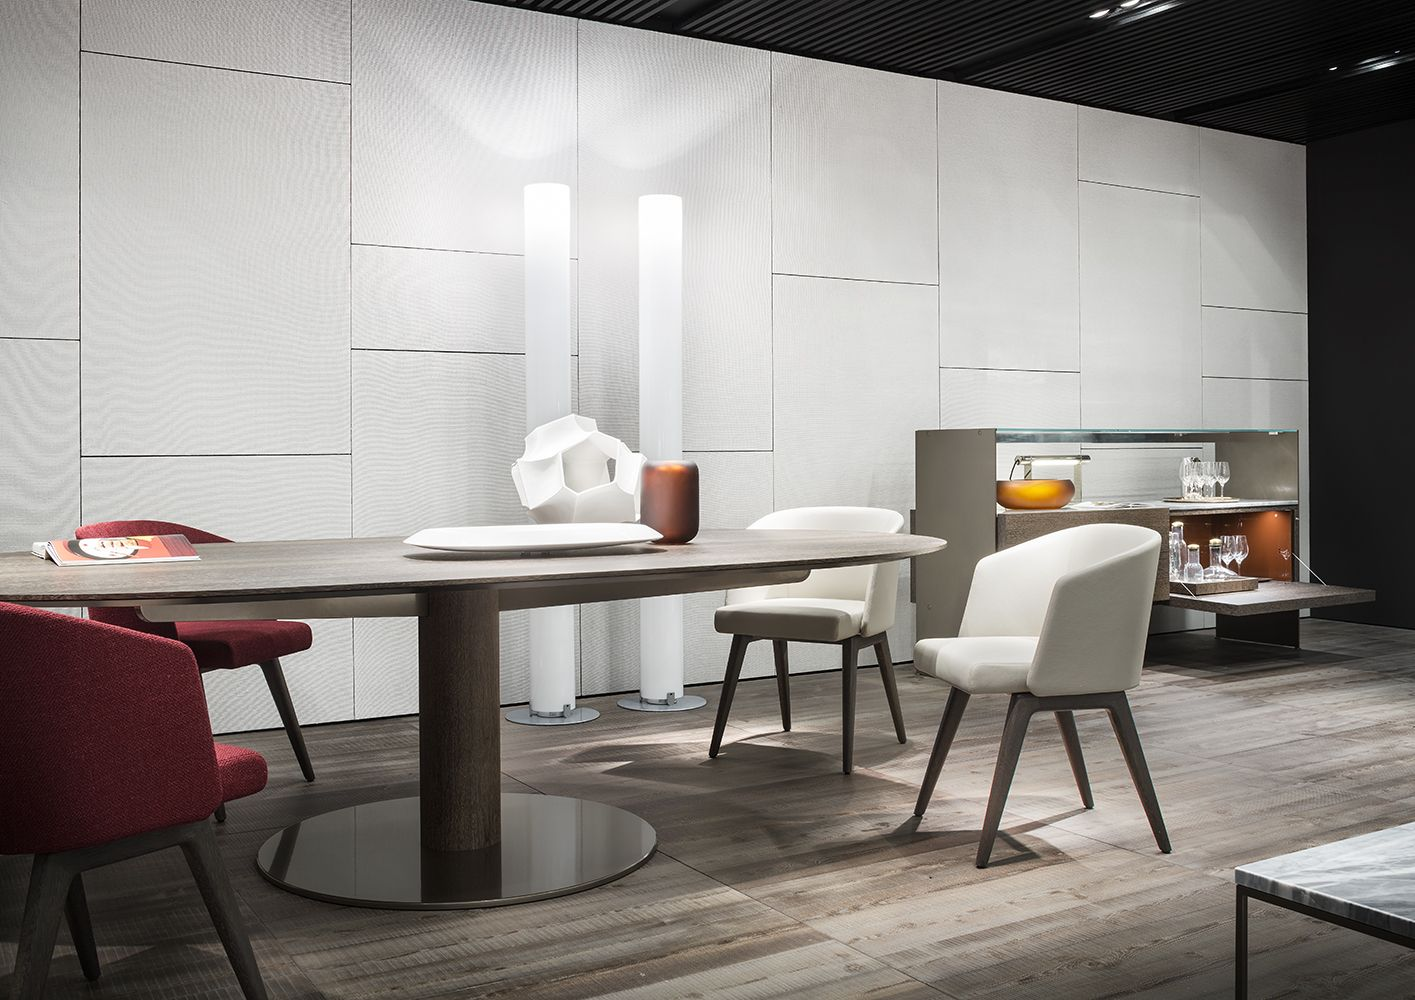 Creed little armchair, Bellagio Dining Wood - Rodolfo ...